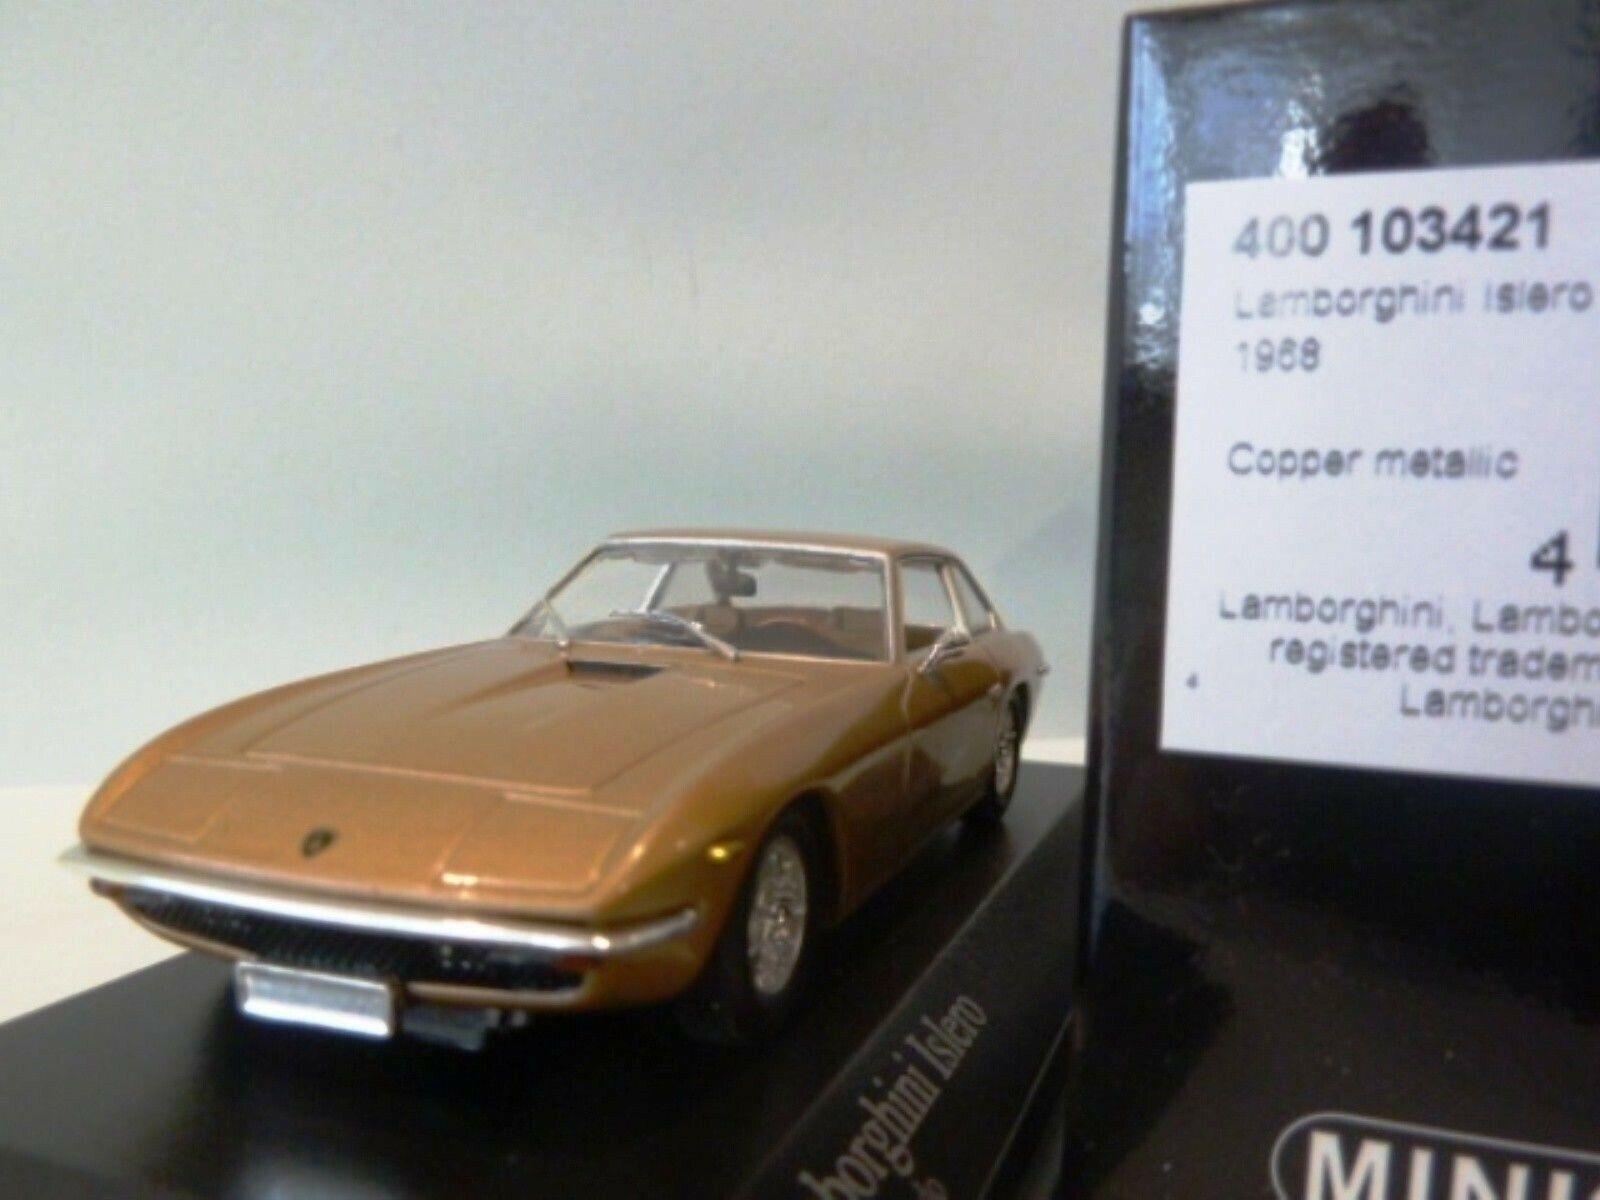 WOW EXTREMELY RARE Lamborghini Islero 2+2 1968 gold m 1 43 Minichamps-Espada GT